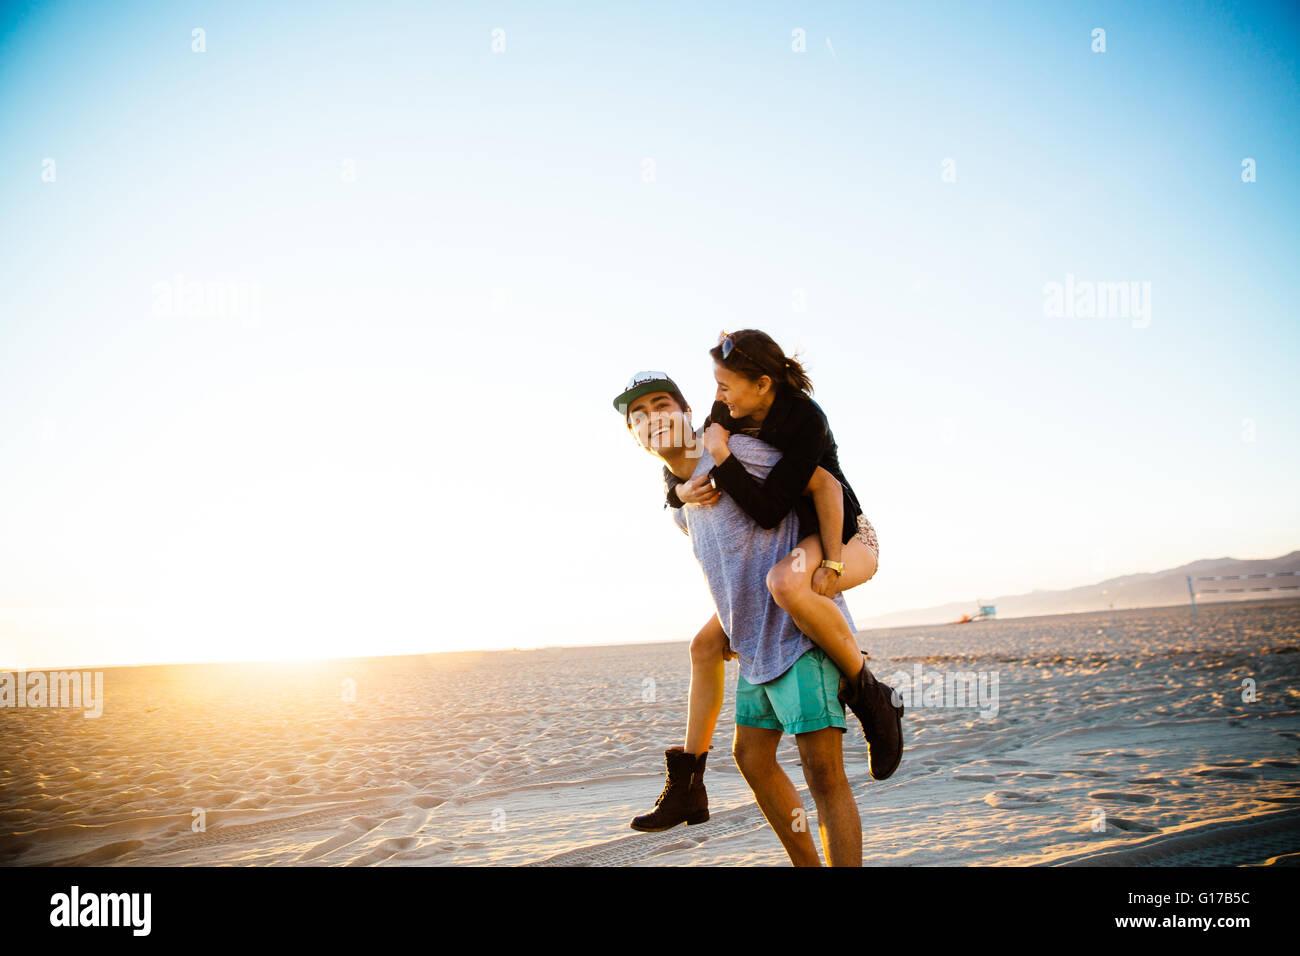 Junger Mann mit Freundin eine Huckepack am Beach, Venice Beach, Kalifornien, USA Stockbild